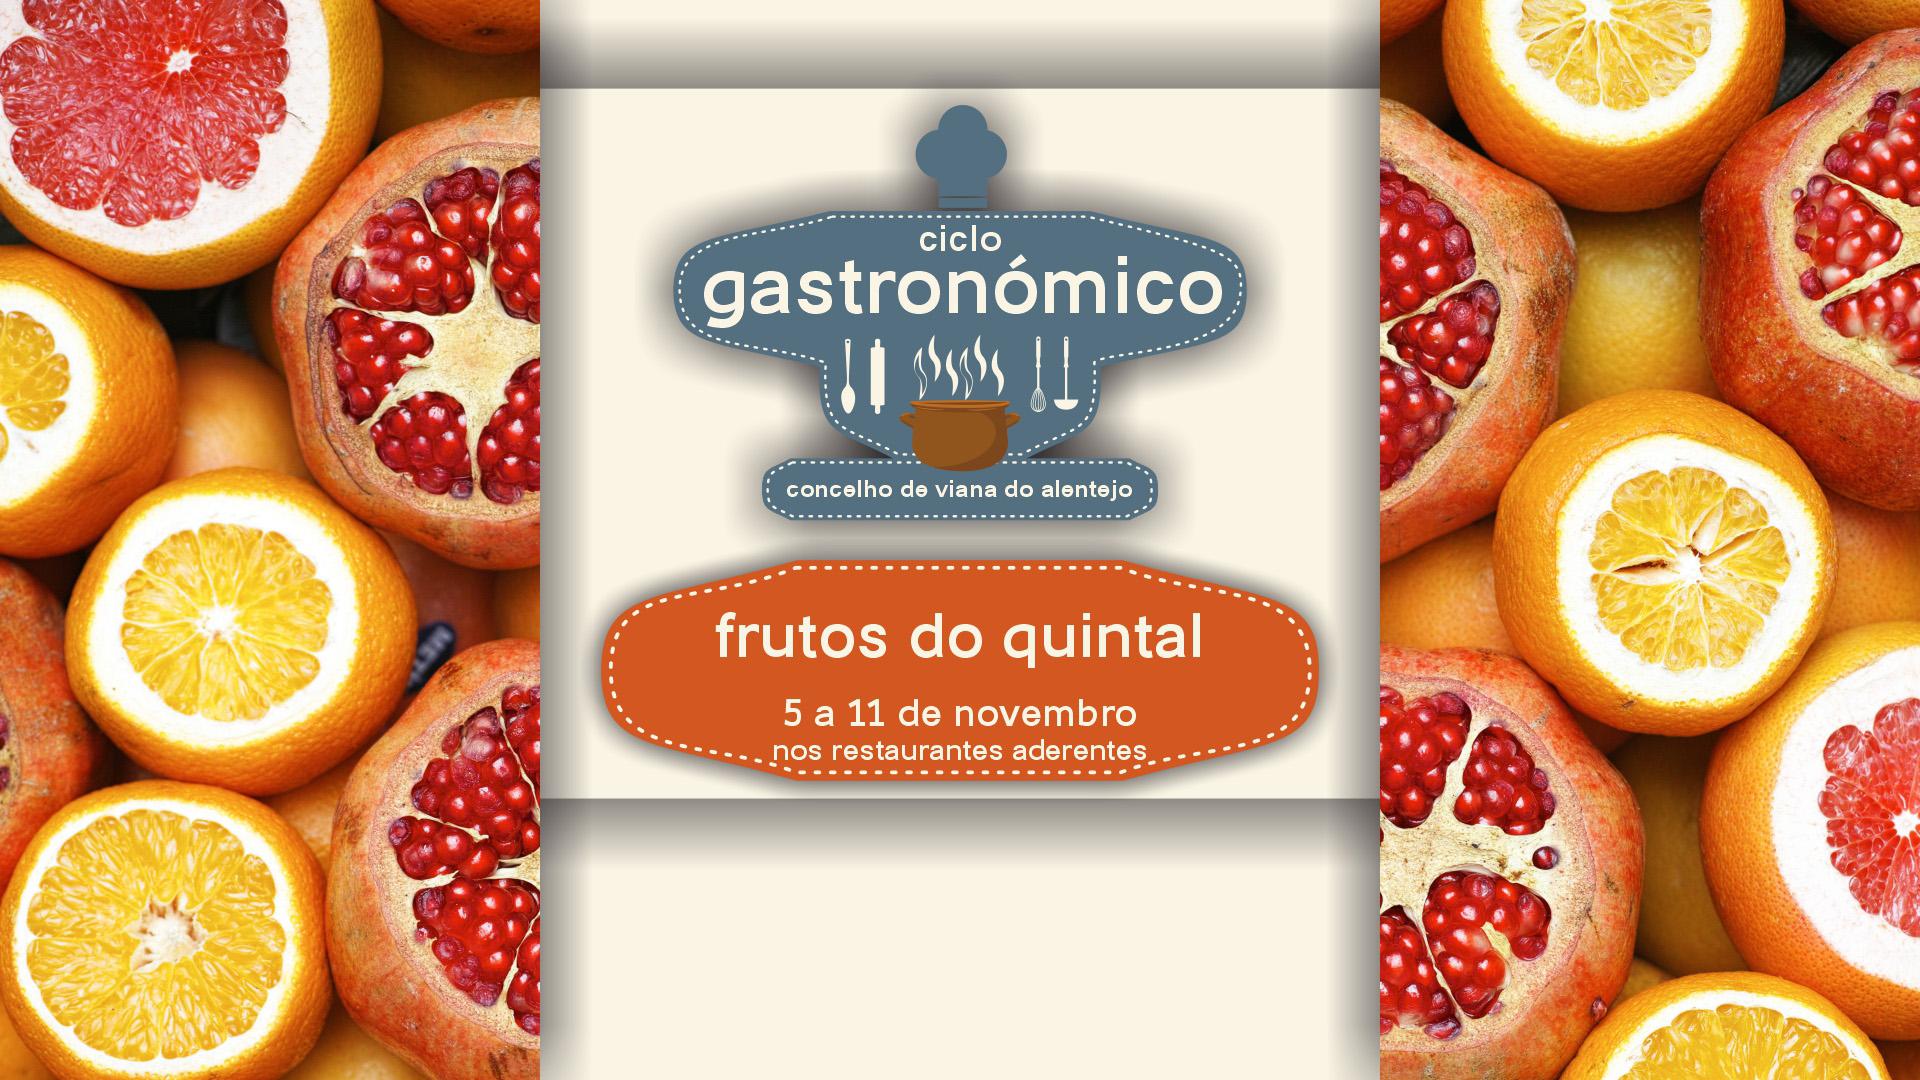 Ciclo Gastronómico – Frutos do quintal